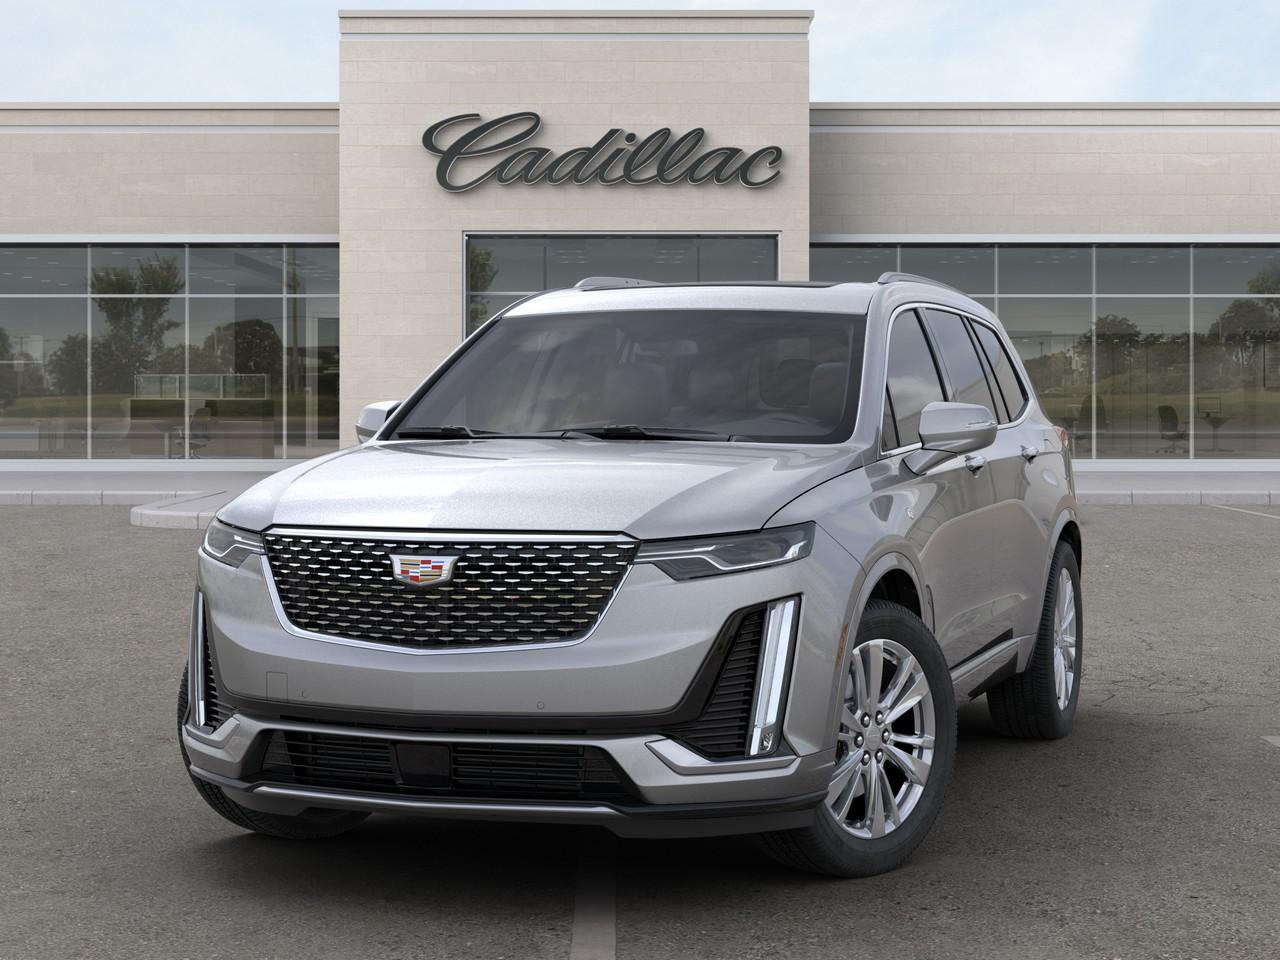 2020 CADILLAC XT6 Premium Luxury Crossover